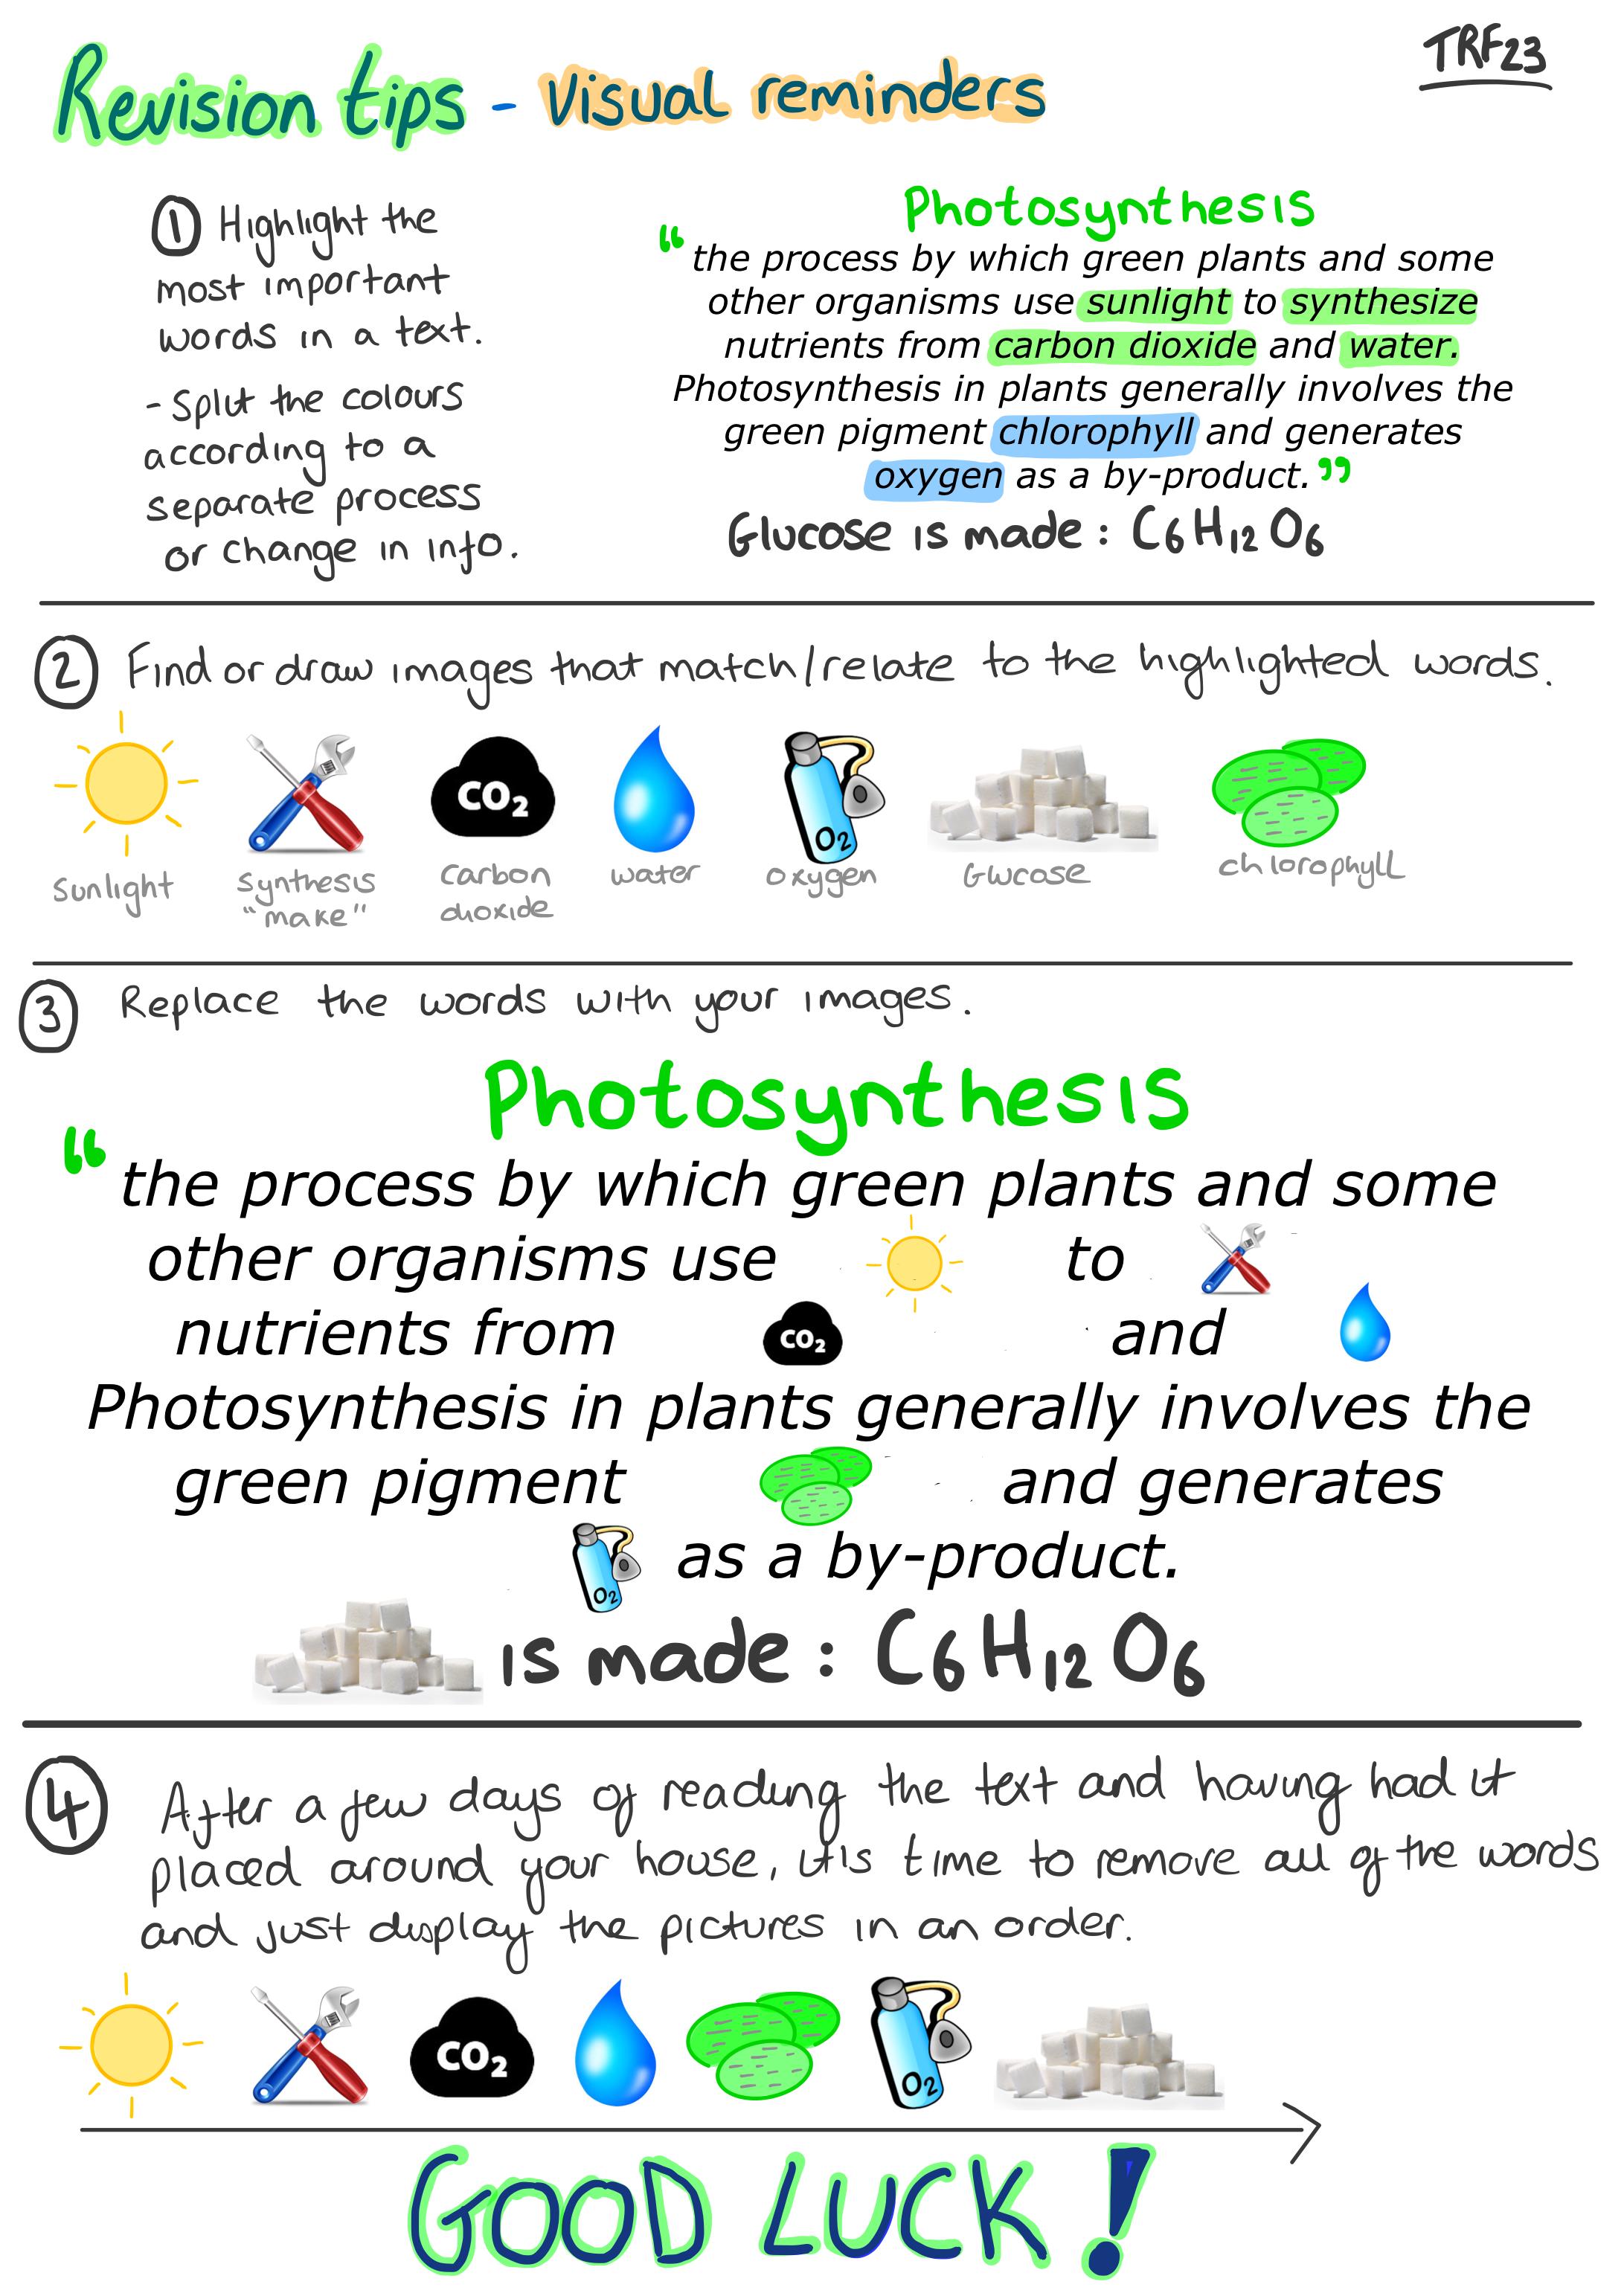 Revision tips - visual reminders